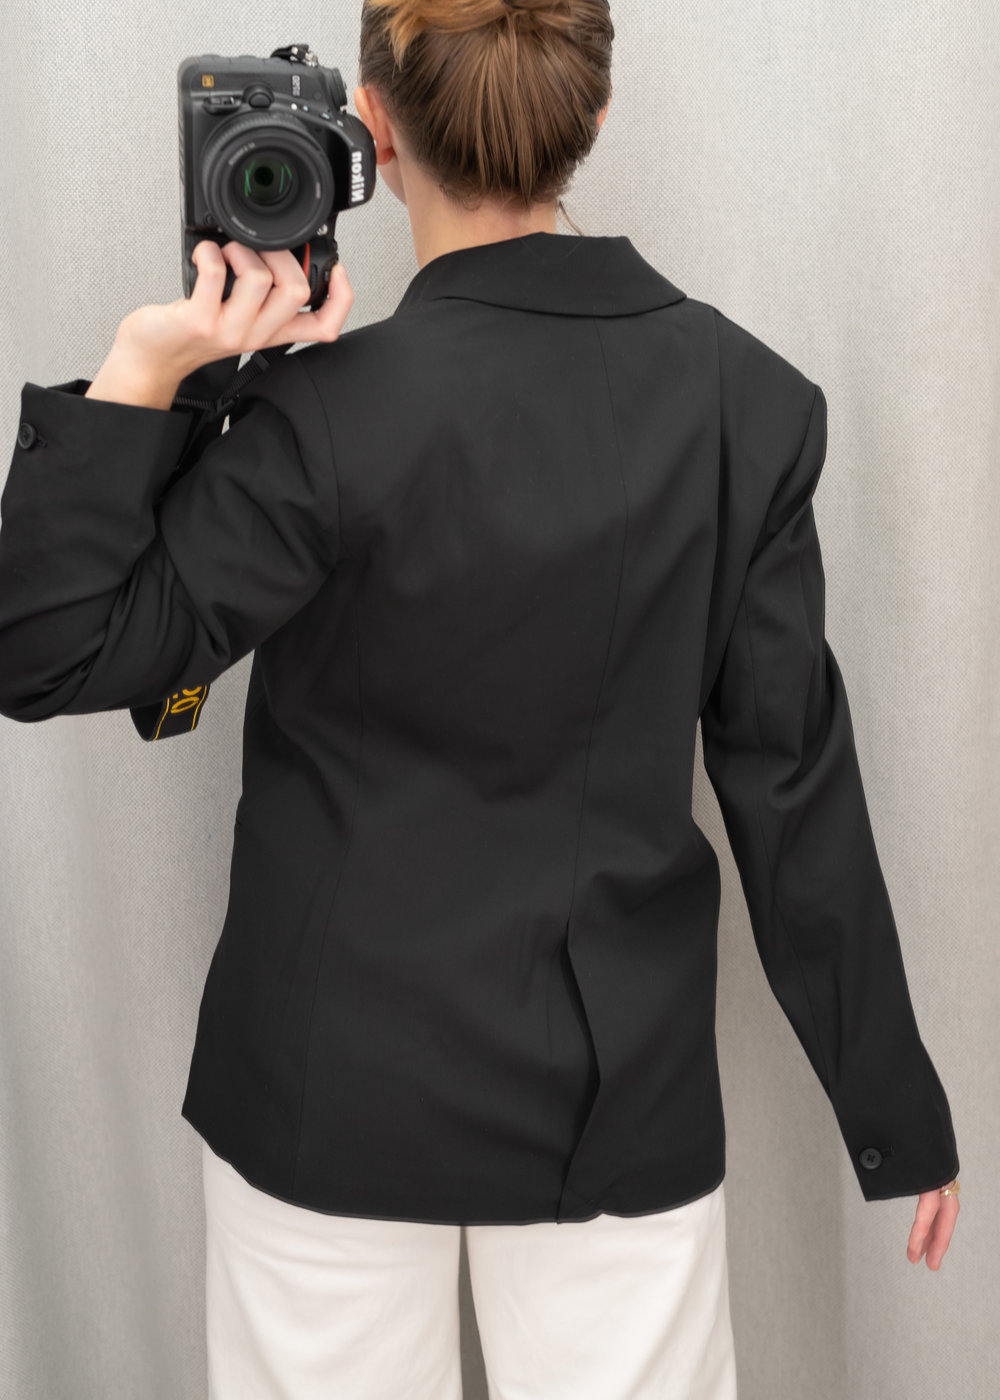 8bdf2794b50e Everlane Italian GoWeave Classic Blazer - Size 6 - Back View